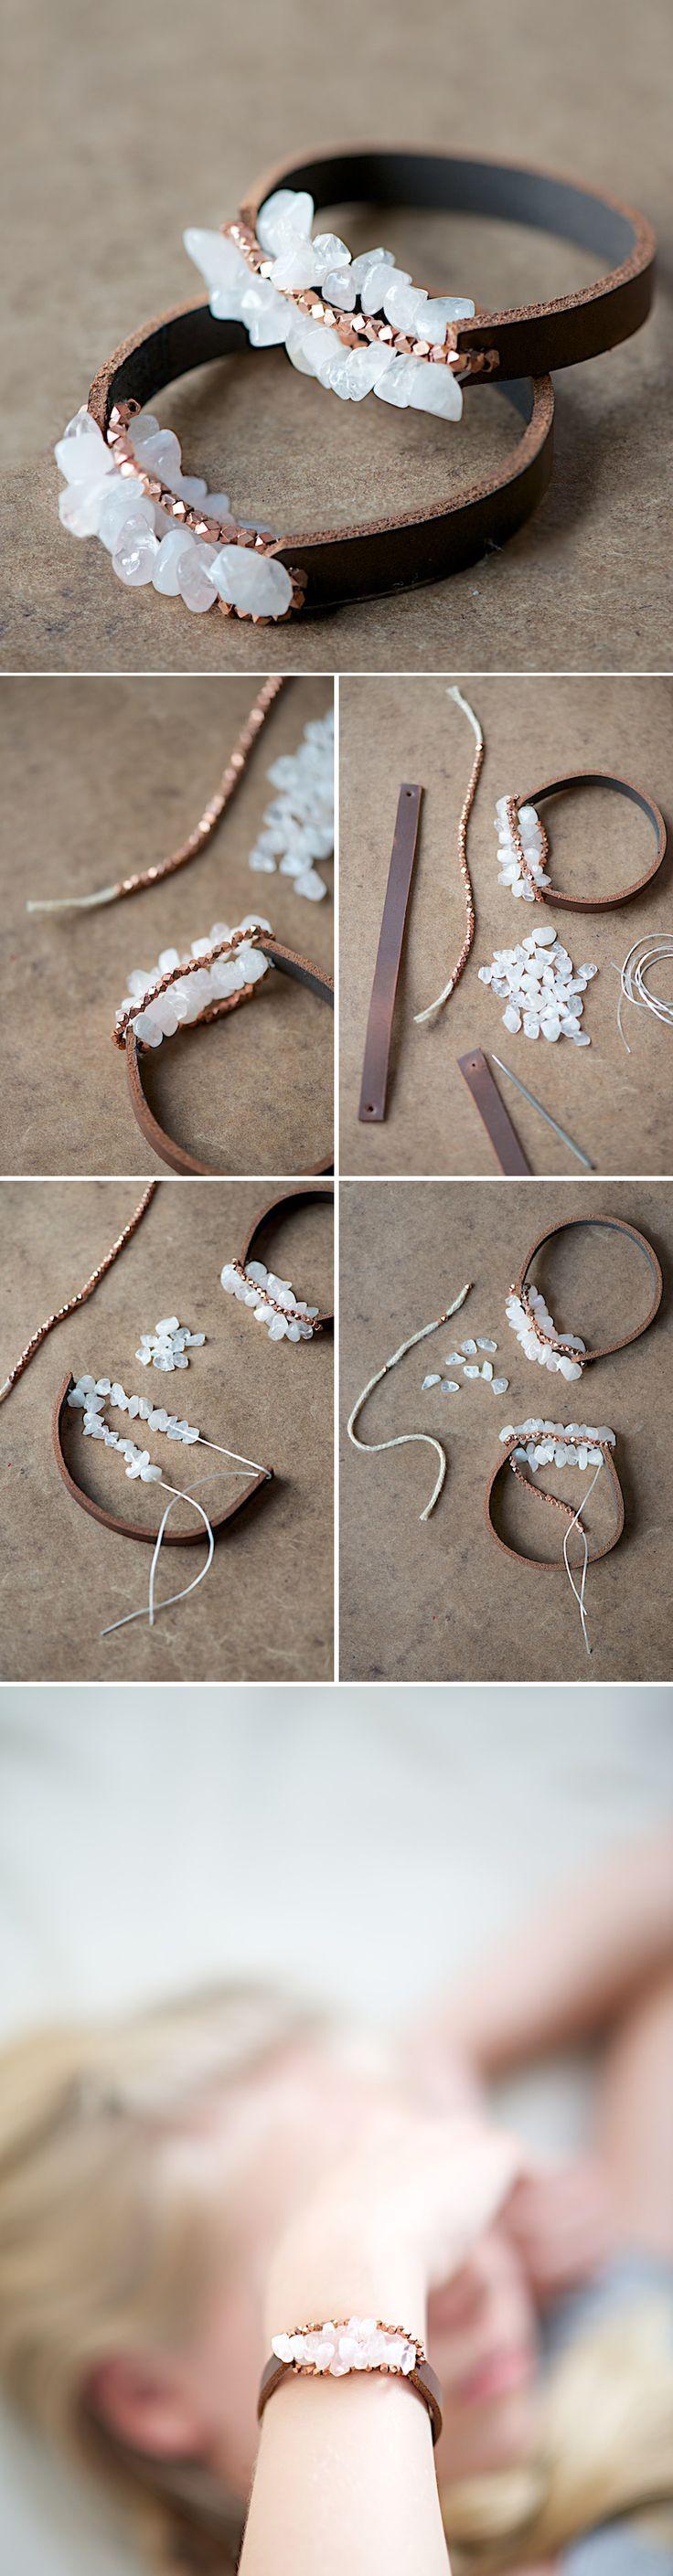 diy leather bracelet tutorial - photo #8